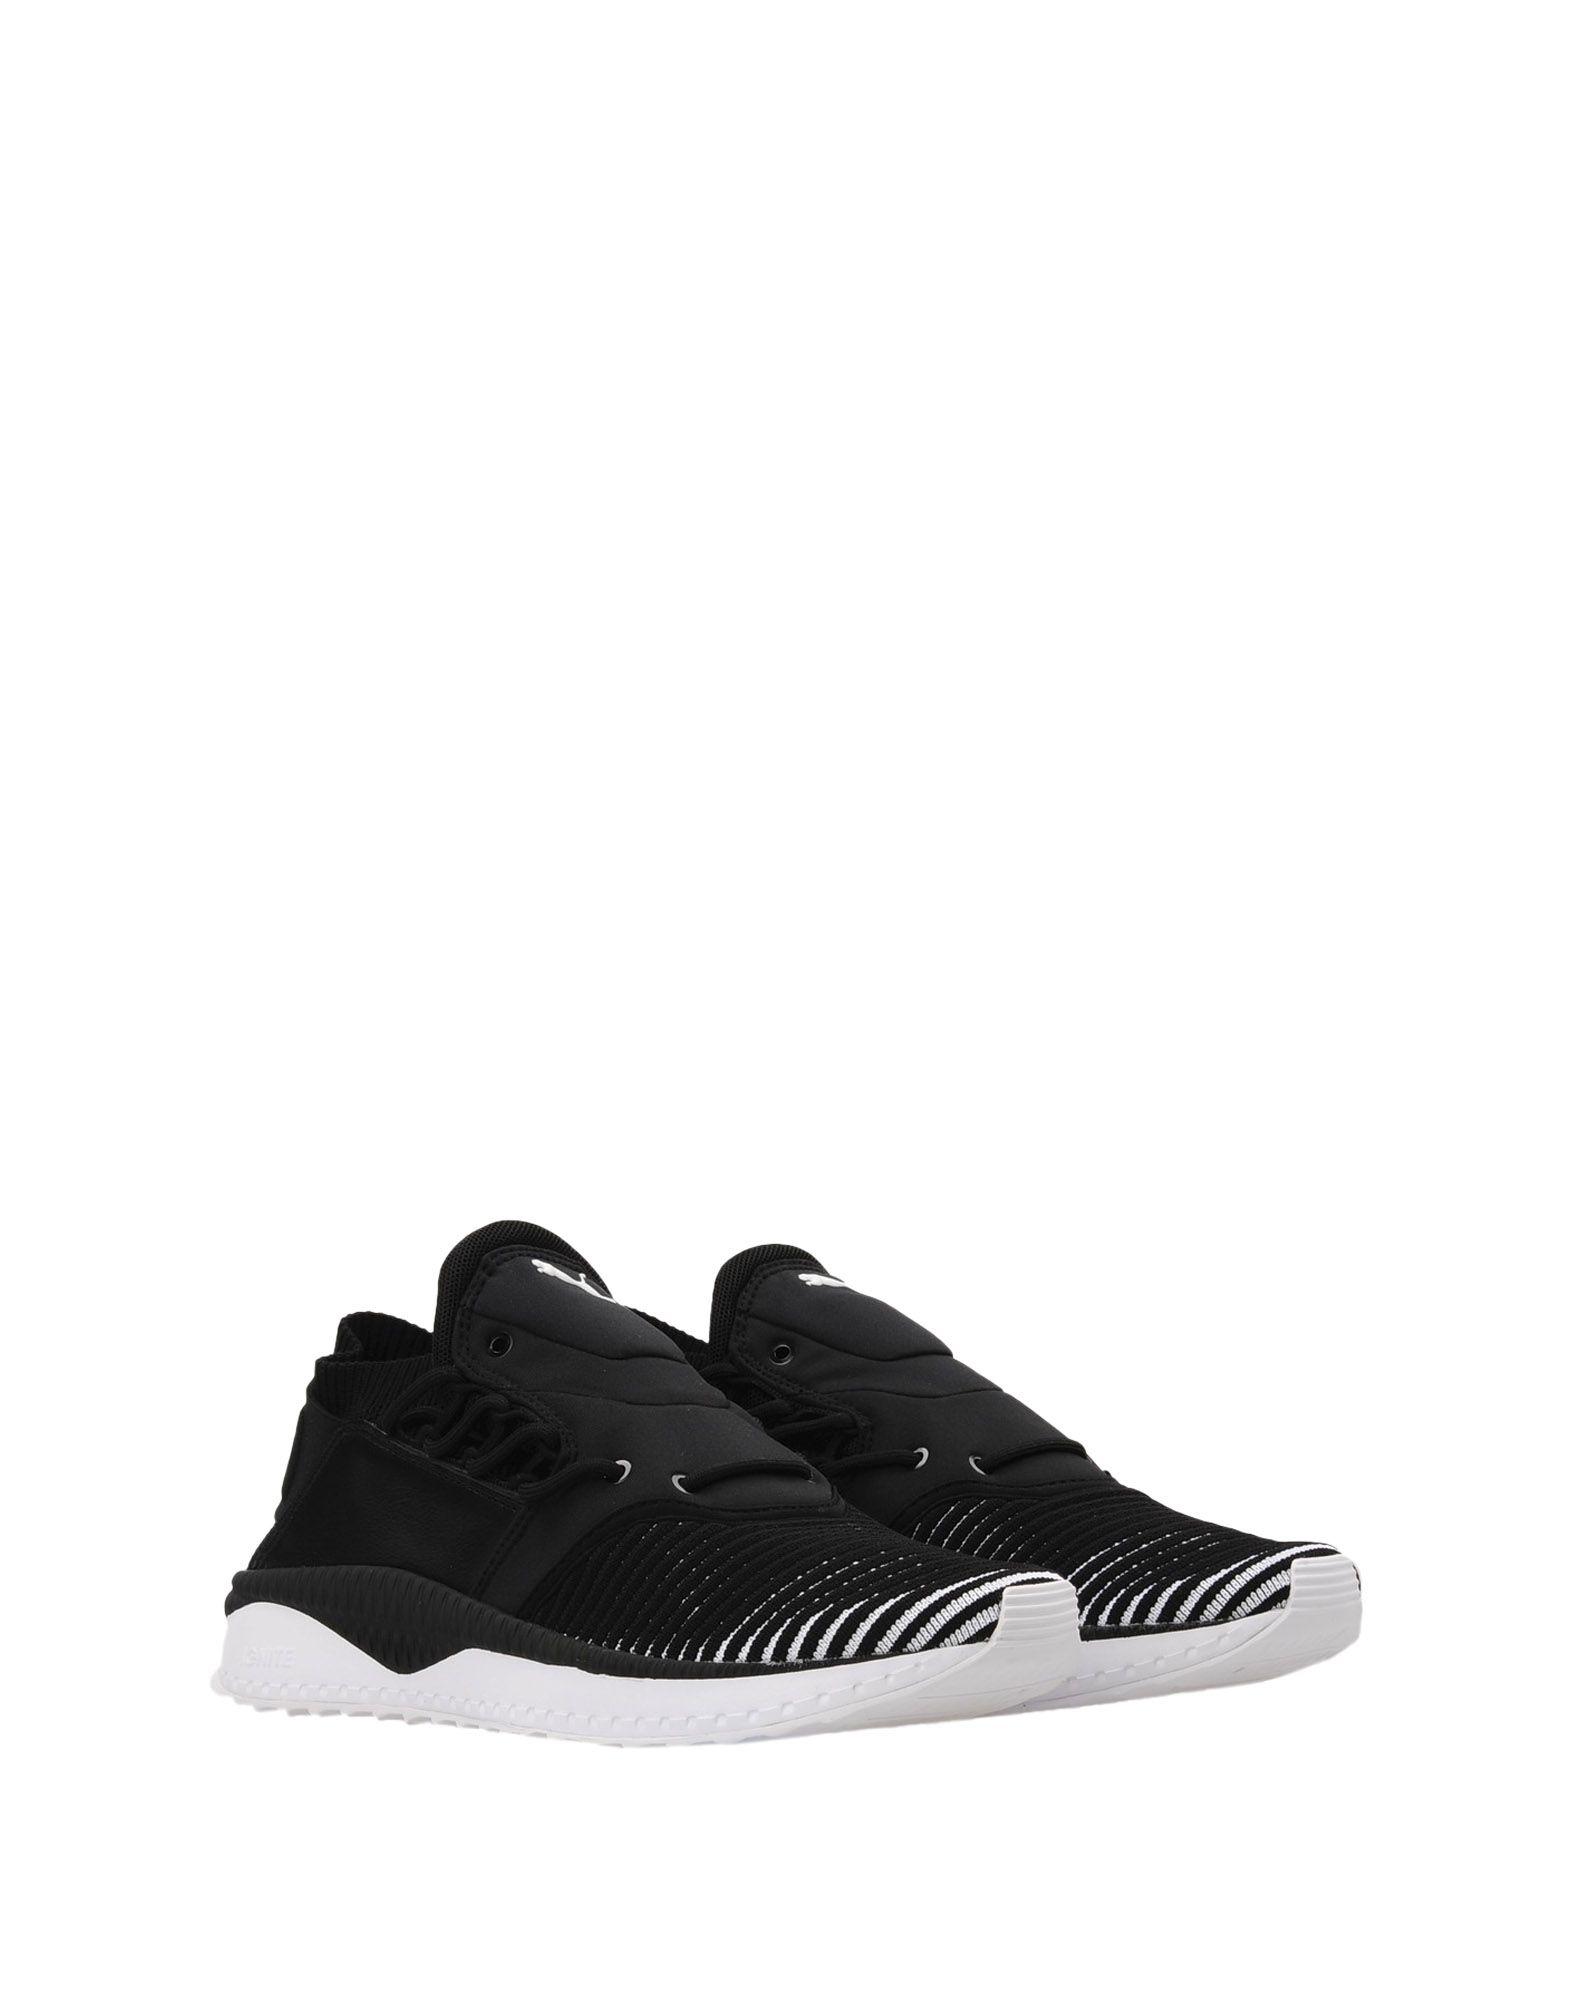 Sneakers Puma Tsugi Shinsei Evoknit - Homme - Sneakers Puma sur